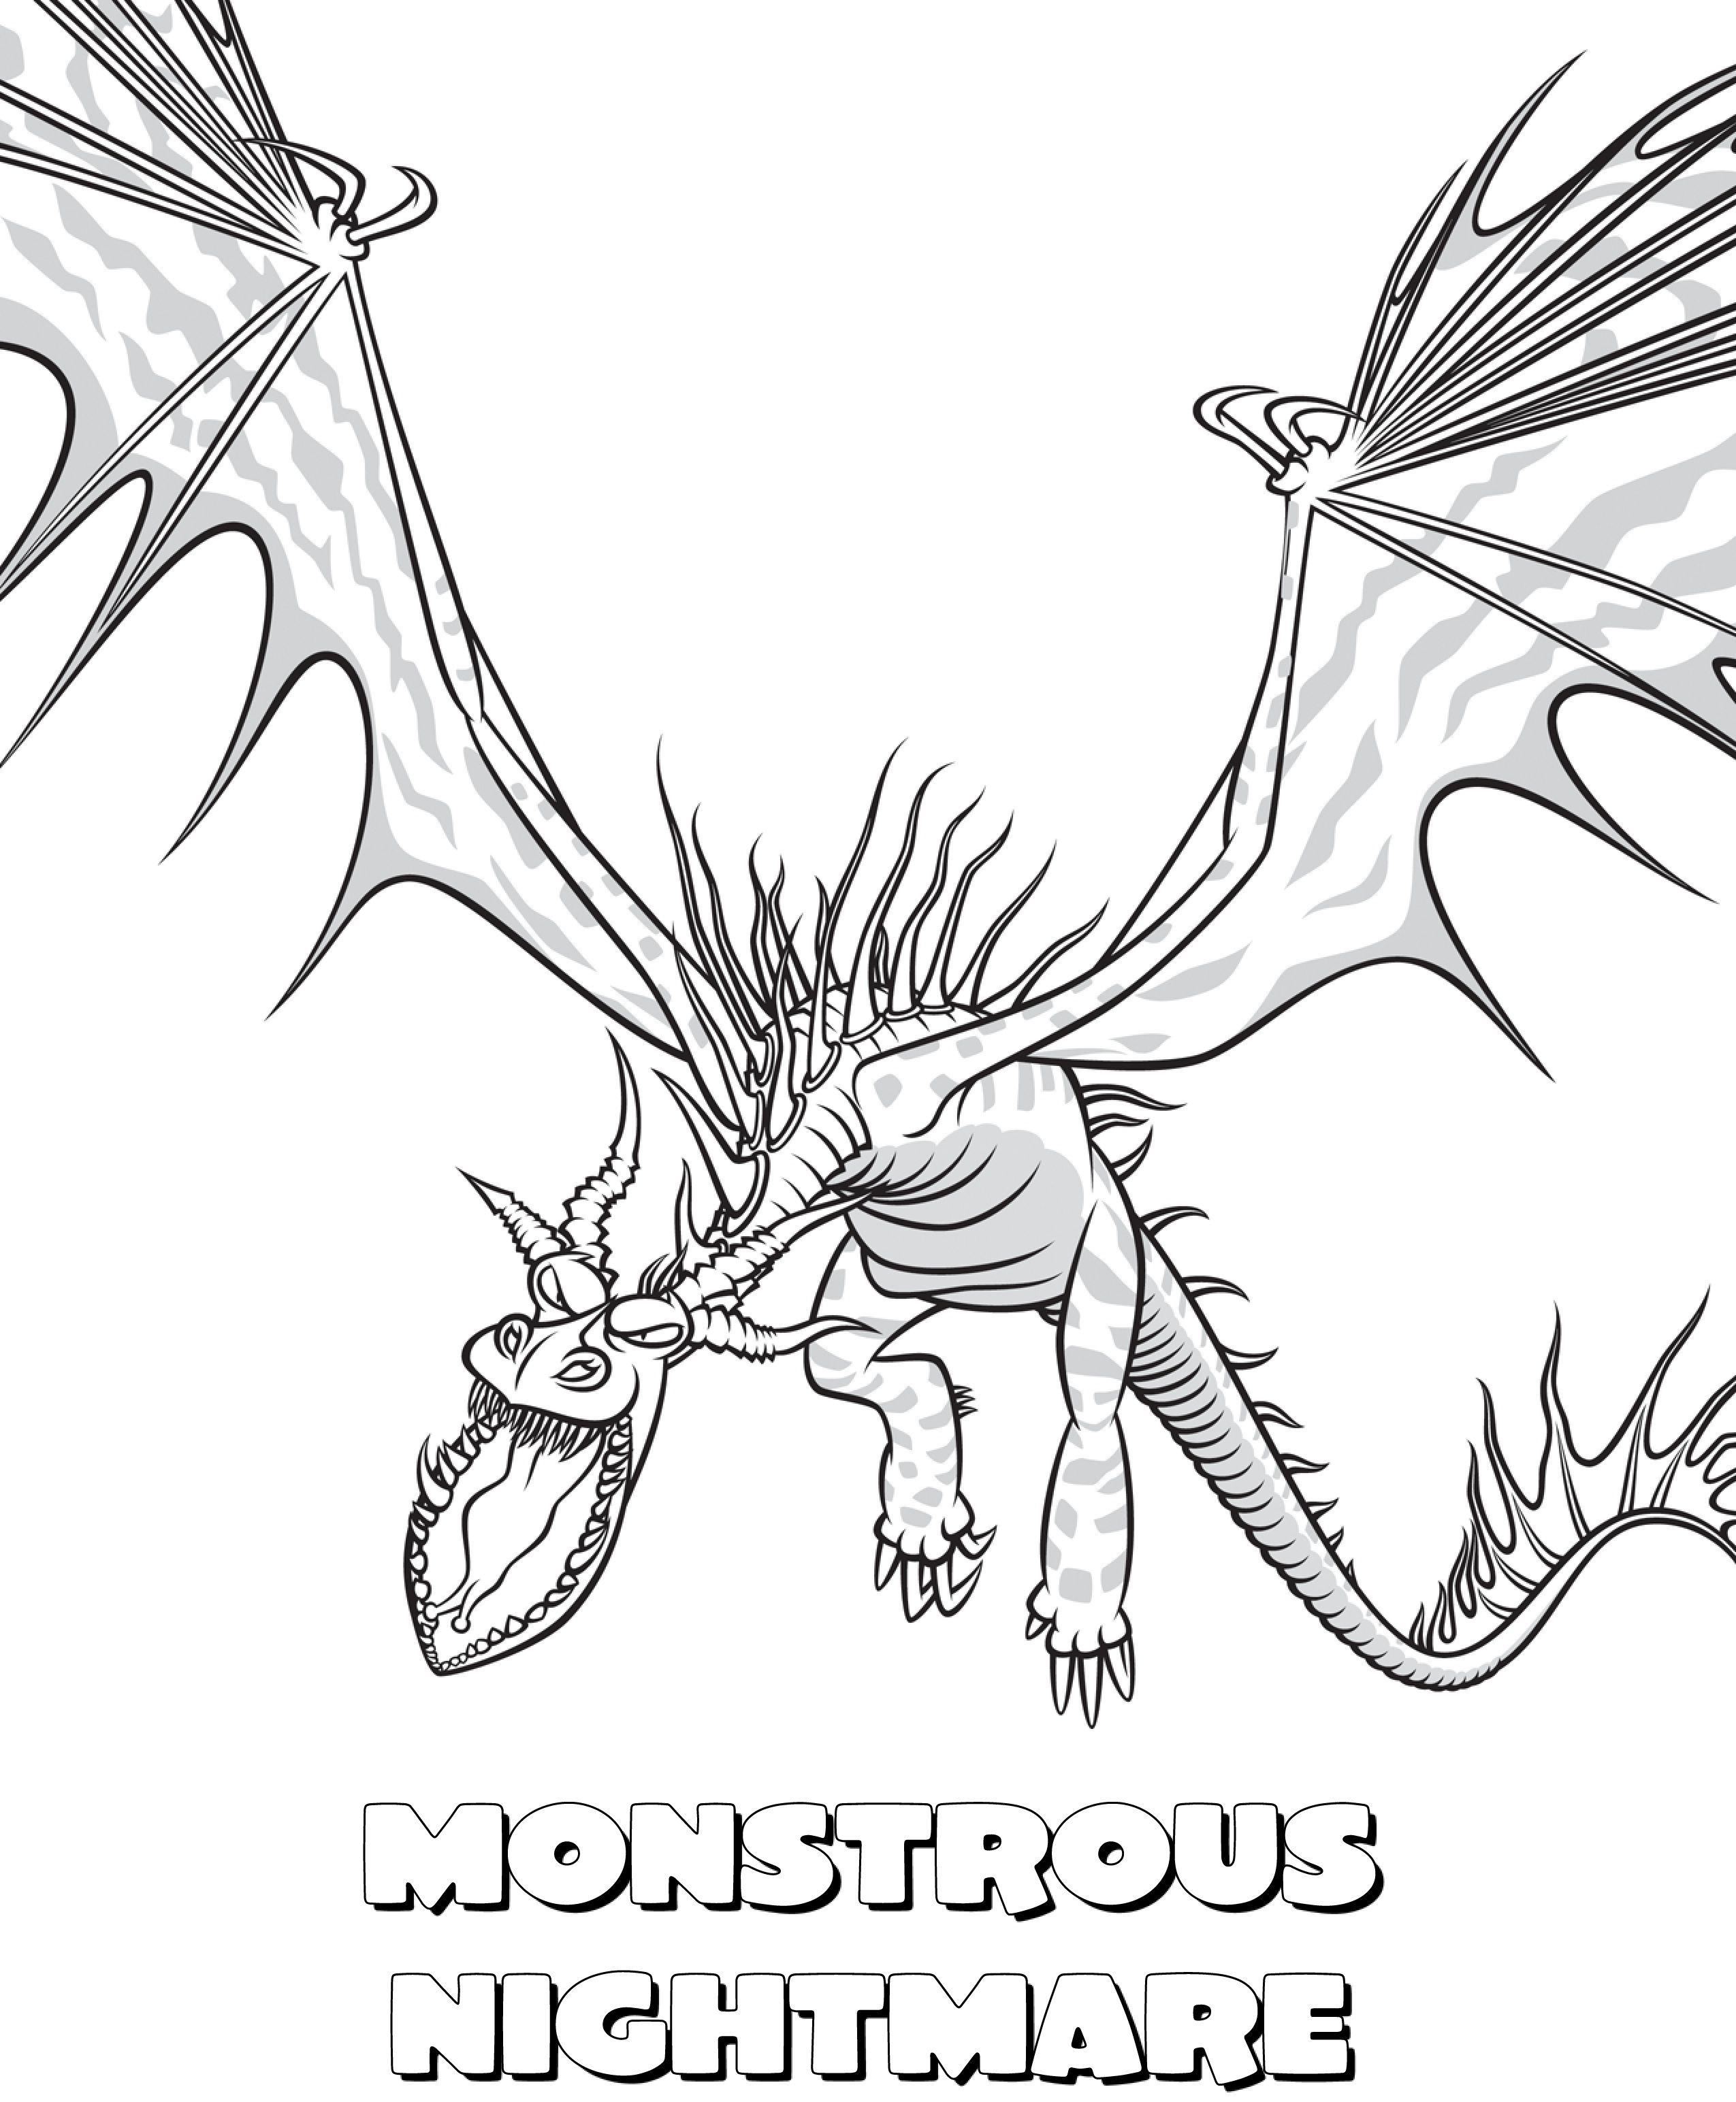 Monstrous Nightmare Jpg 2550 3088 Entrenando A Tu Dragon Como Entrenar A Tu Dragon Dragones